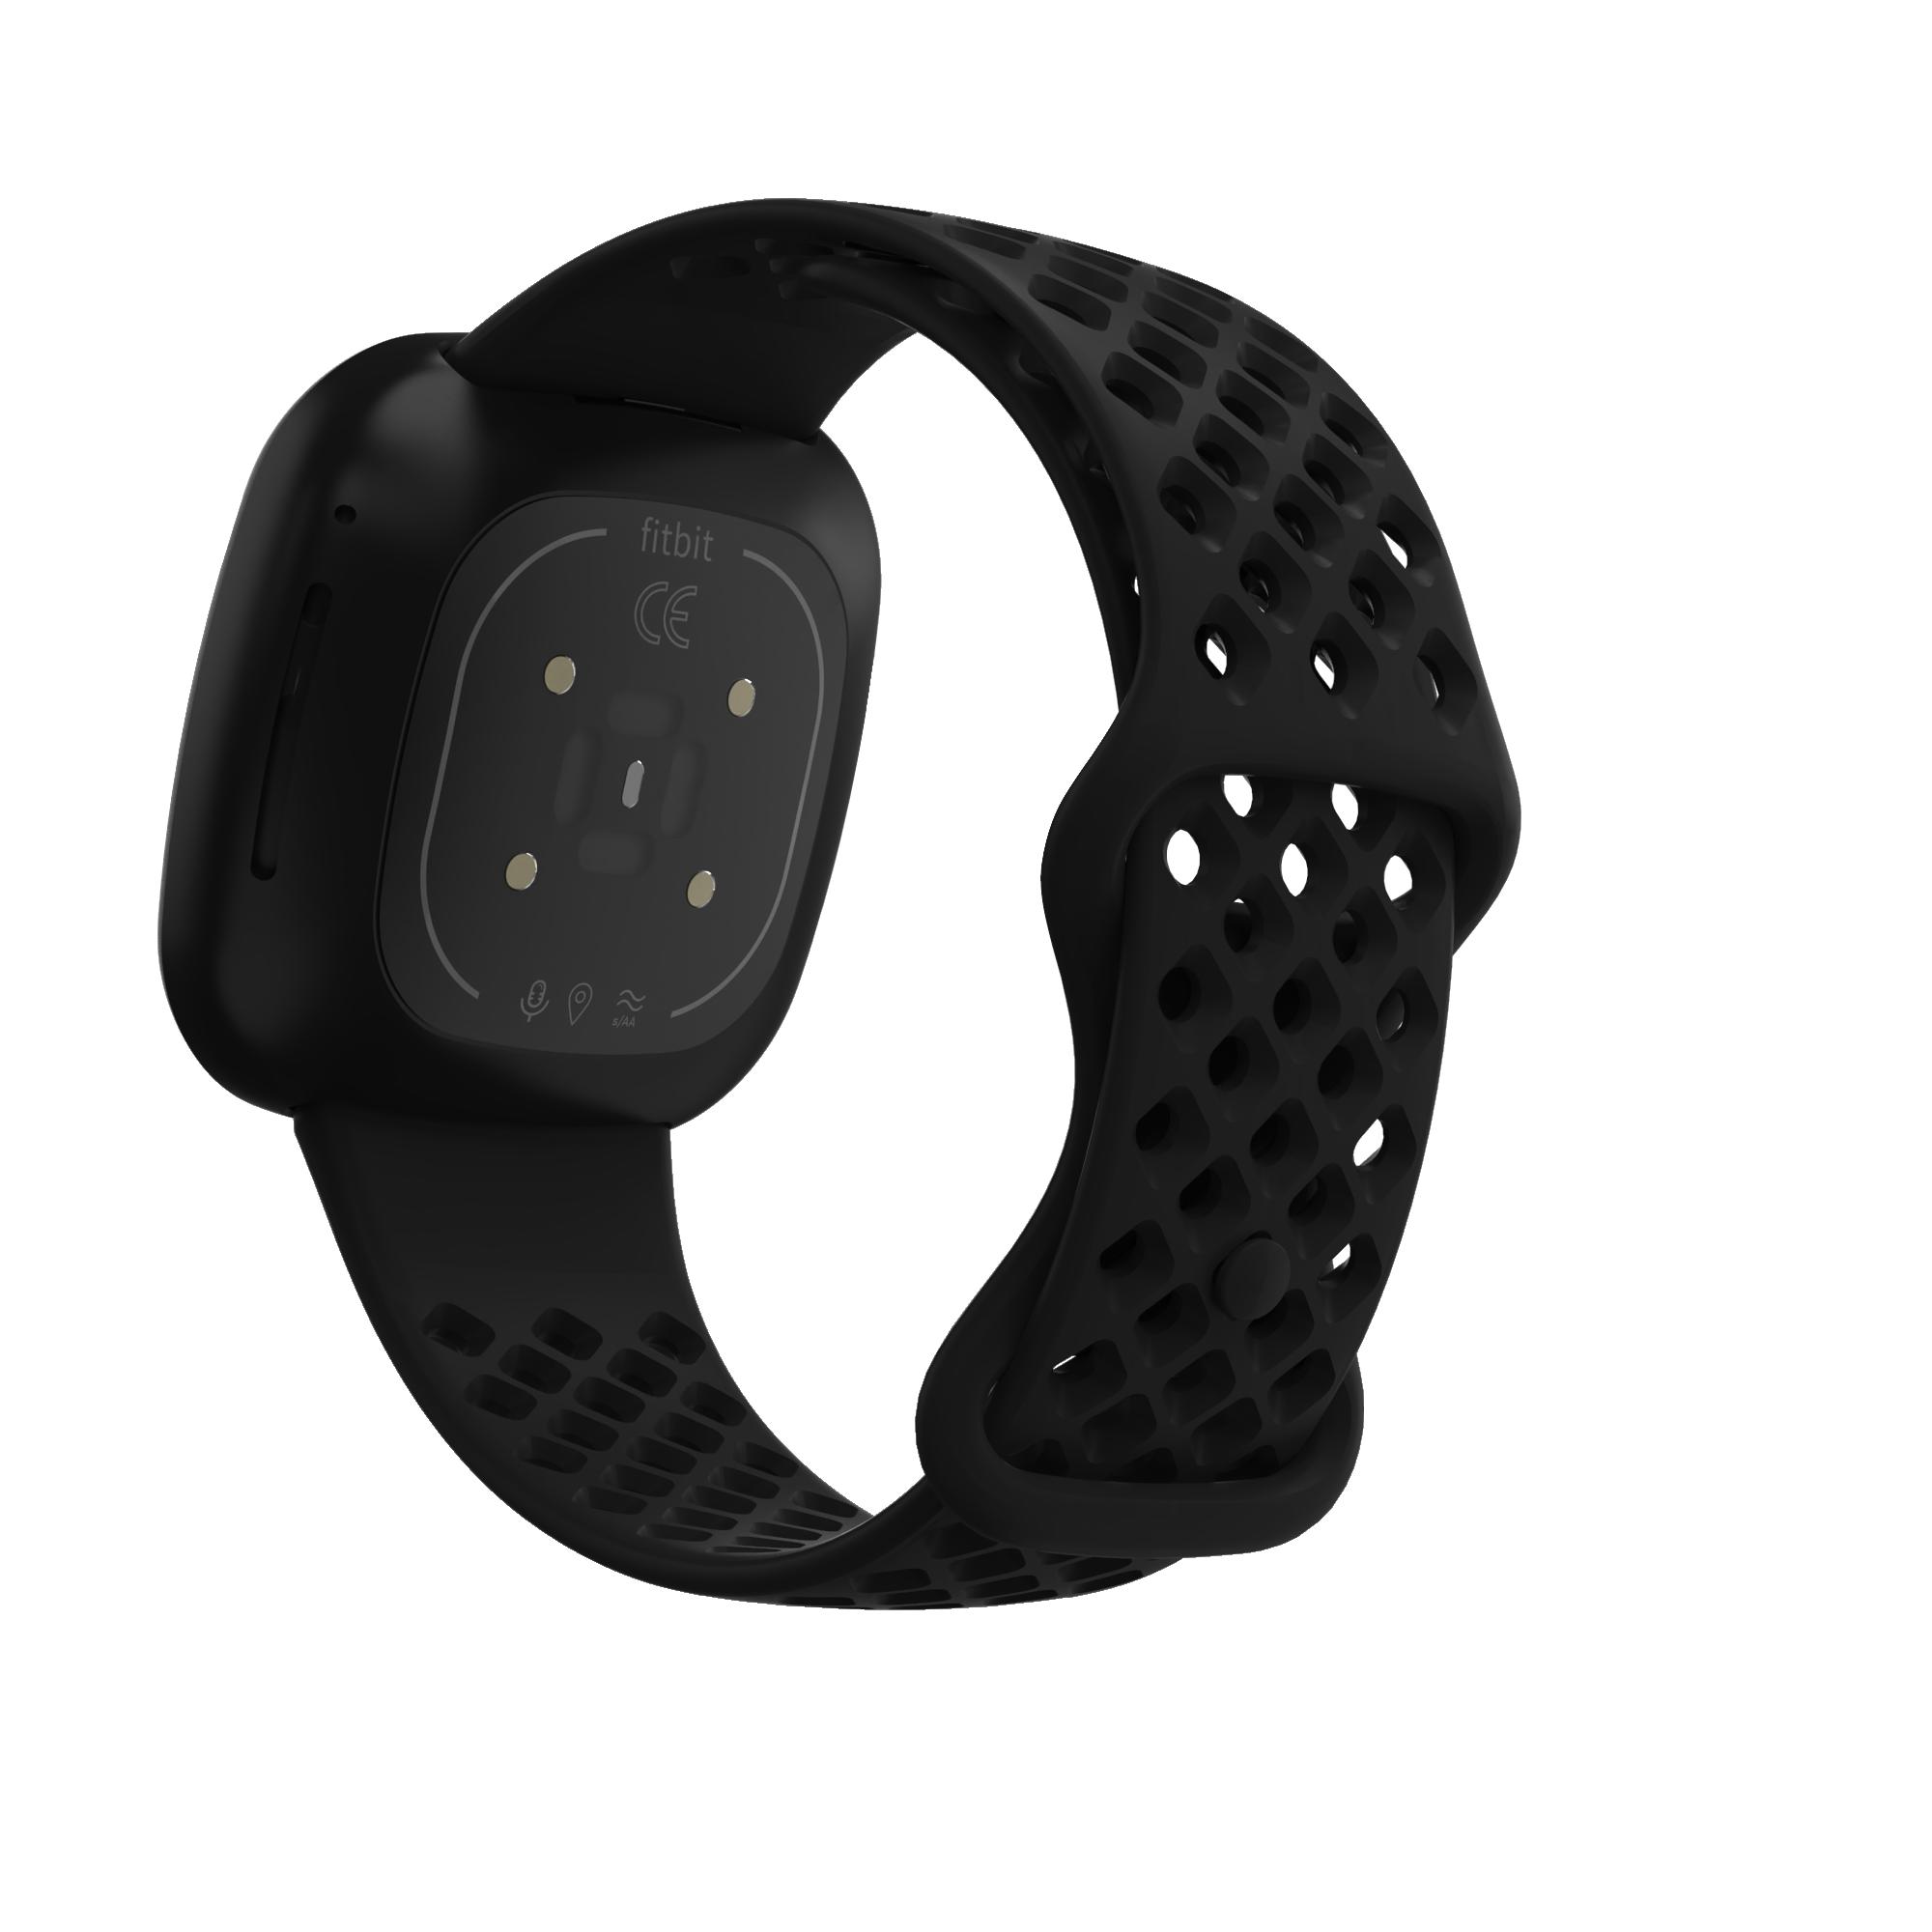 Sport - Silikonrem för Fitbit Versa 3 / Sense- Svart